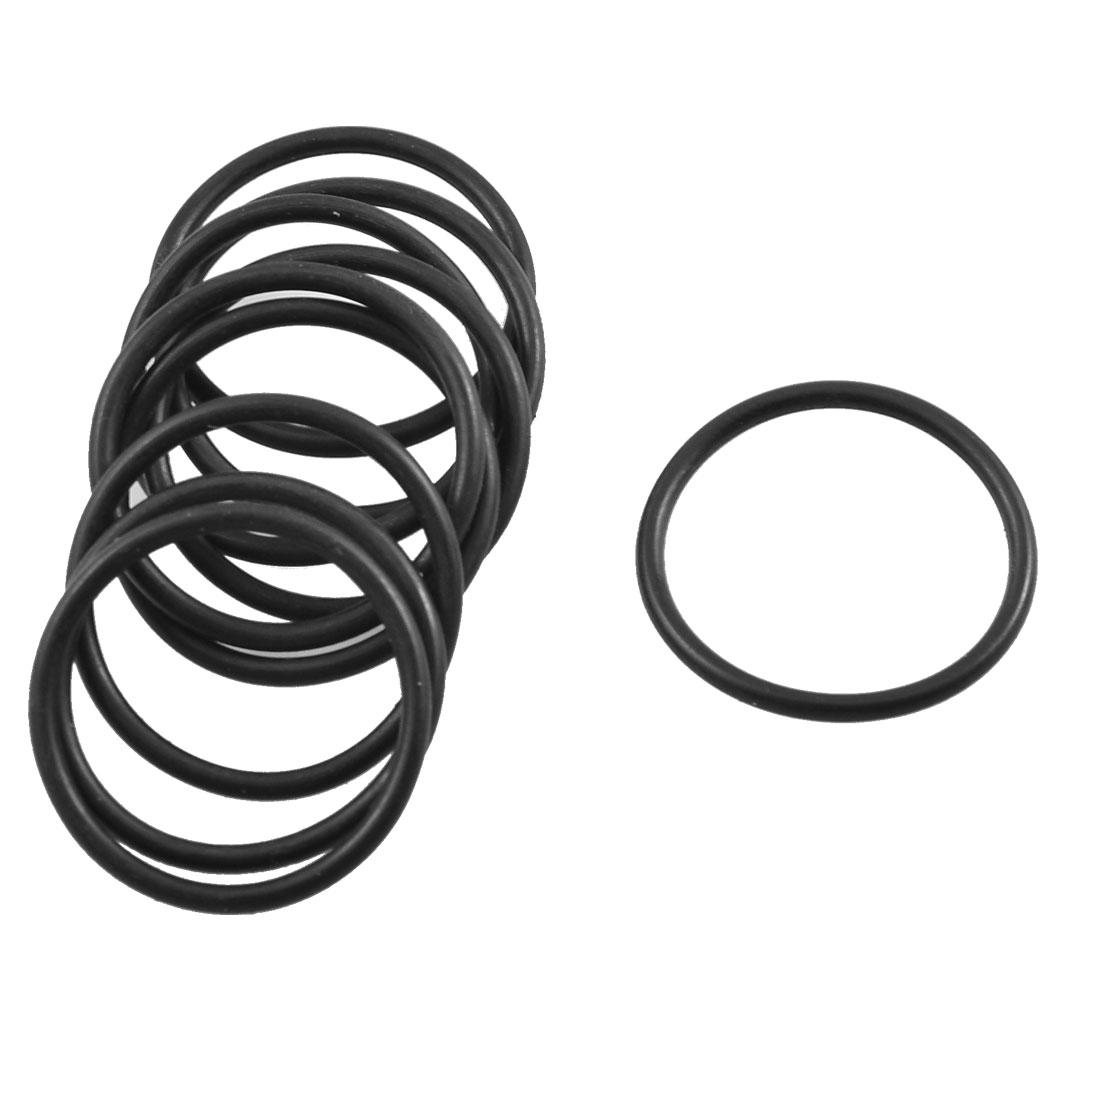 10 Pcs Black Rubber Flexible Oil Seal Gasket O Rings 21.2mm x 1.8mm